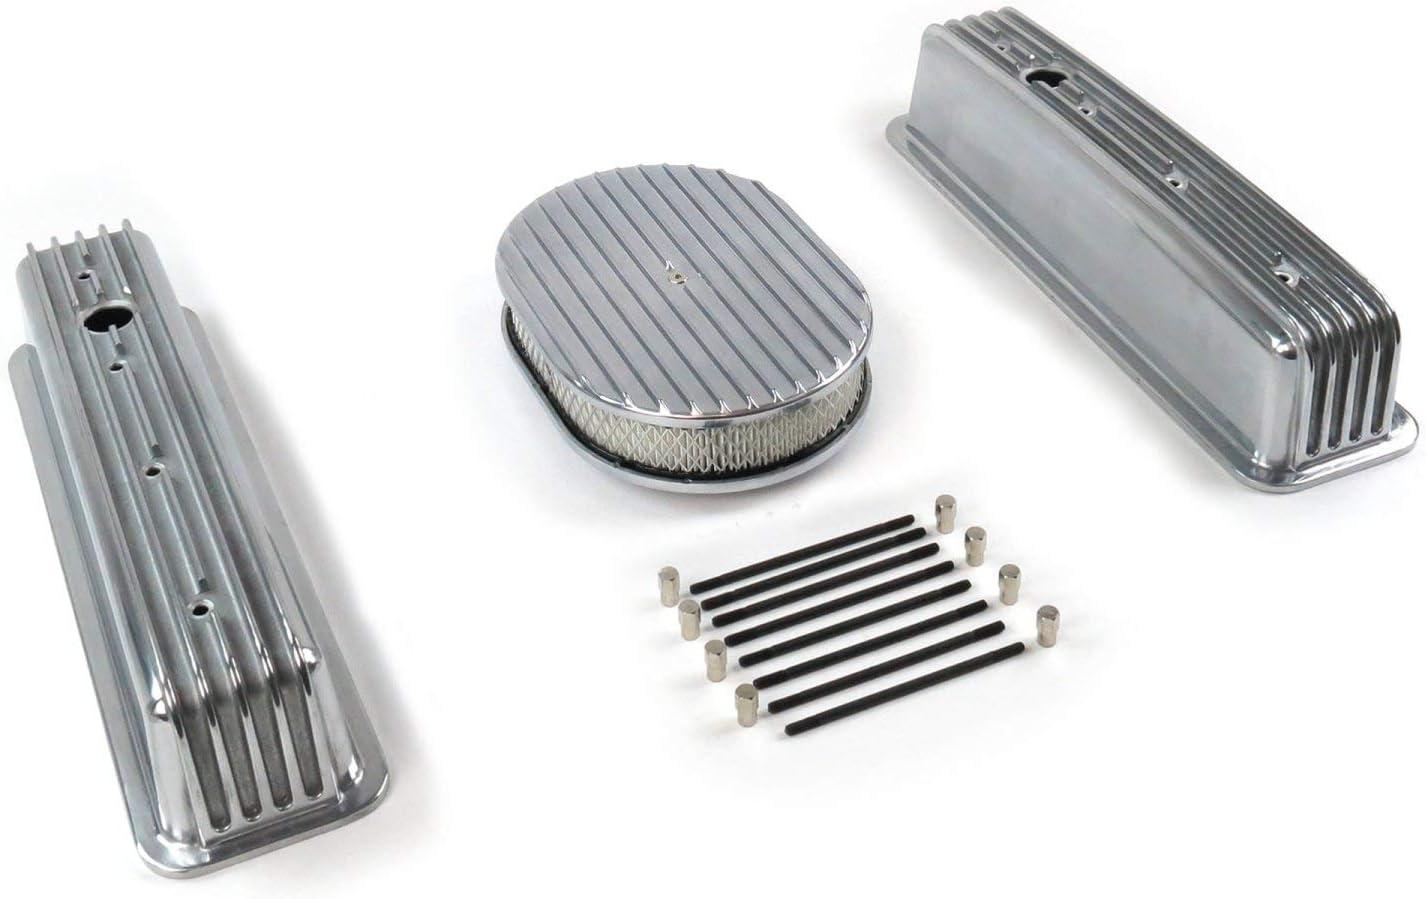 Genuine Hyundai 91400-23300 Engine Control Module Wiring Assembly